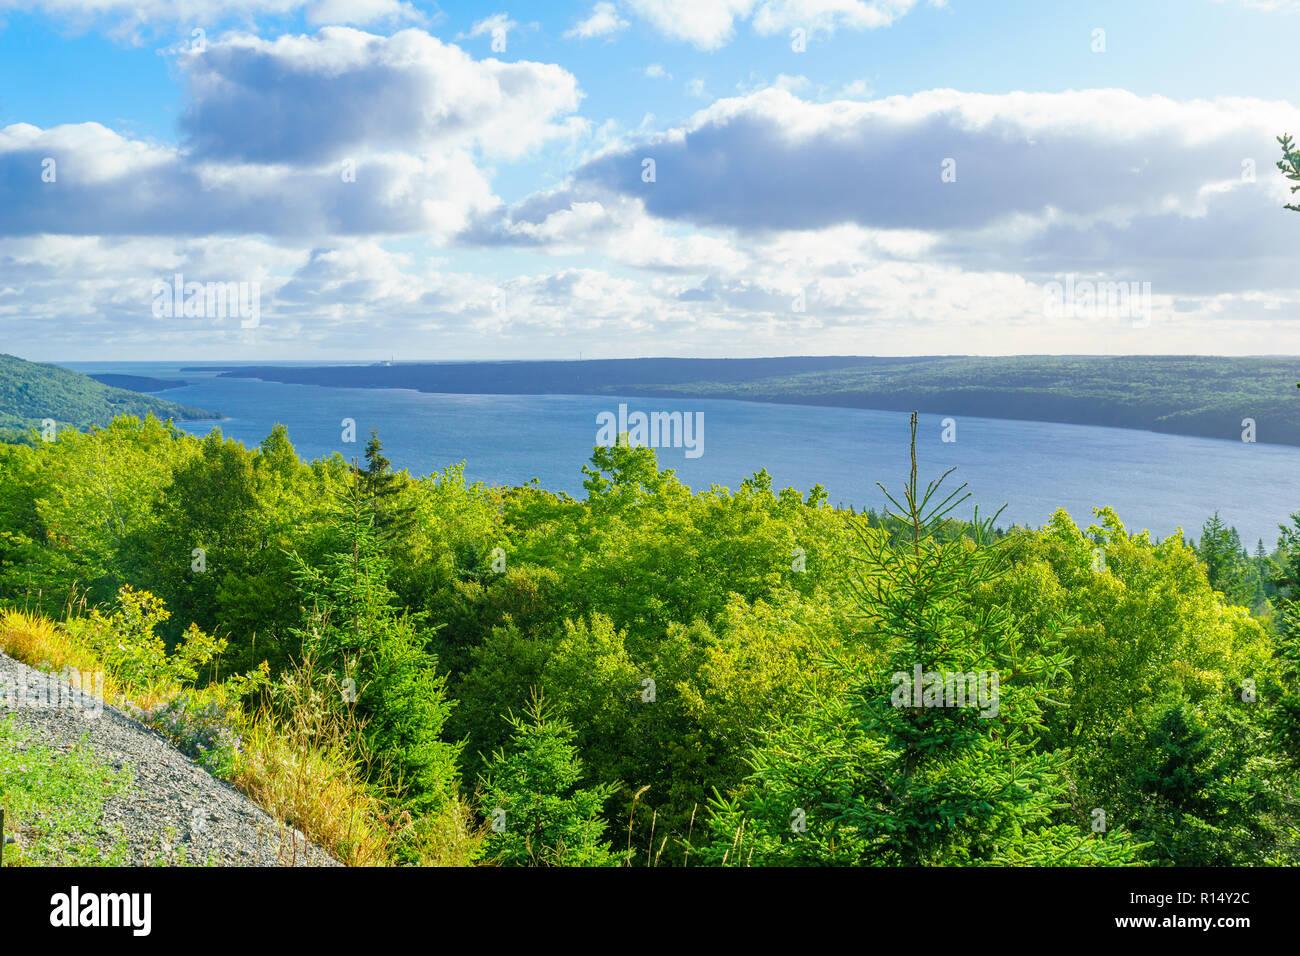 View of the Bras d-Or Lake, in Cape Breton island, Nova Scotia, Canada - Stock Image